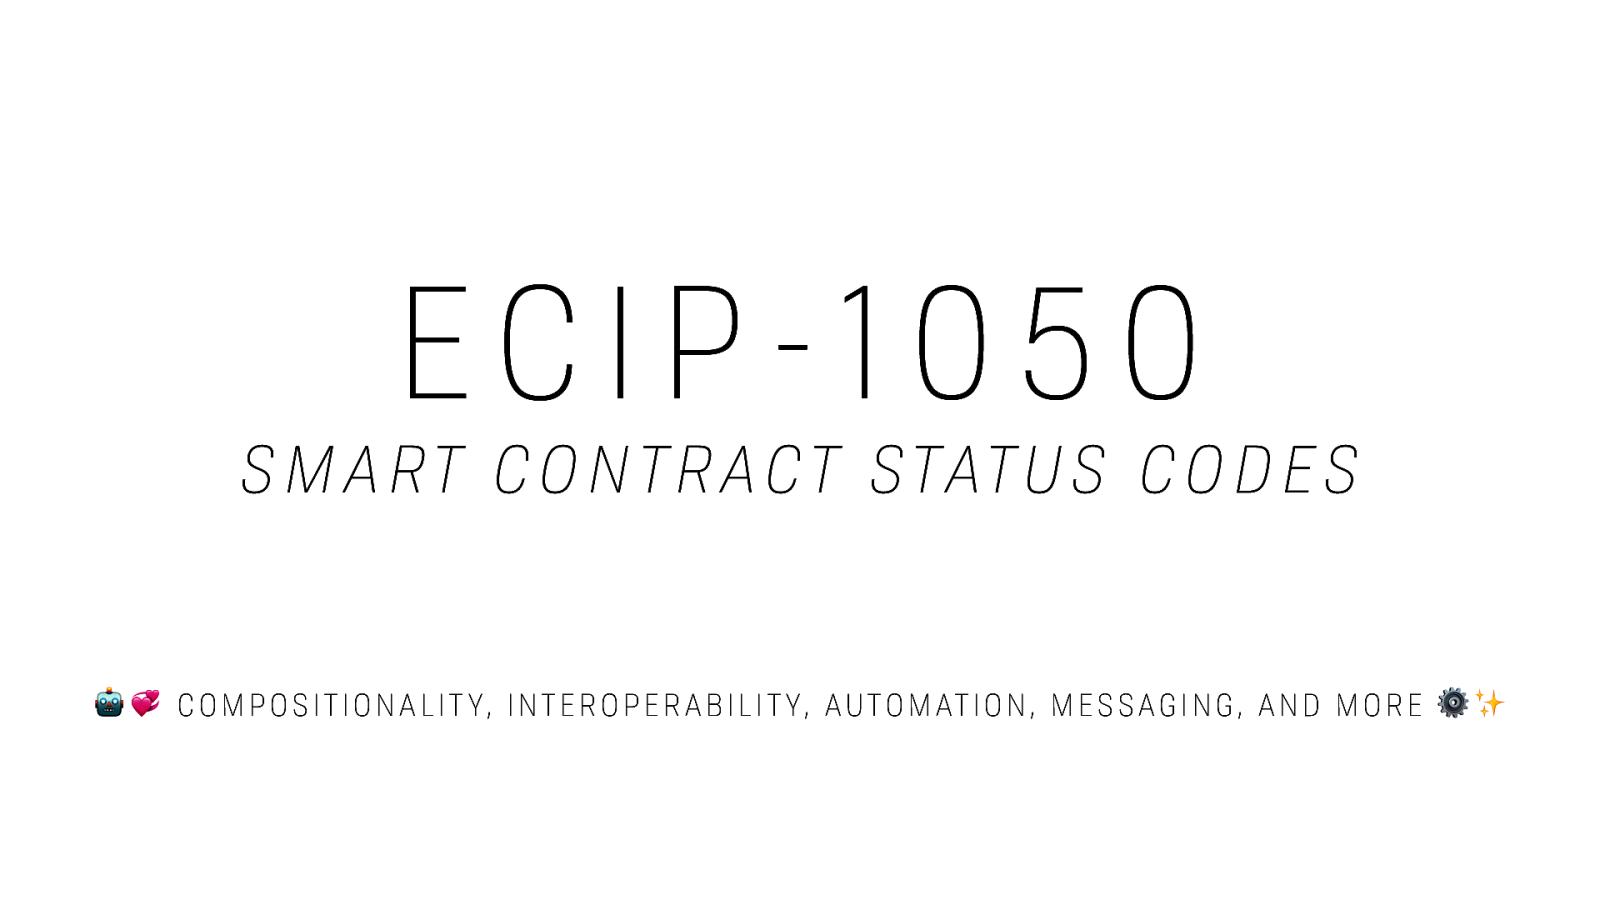 ECIP 1050: Smart Contract Status Codes